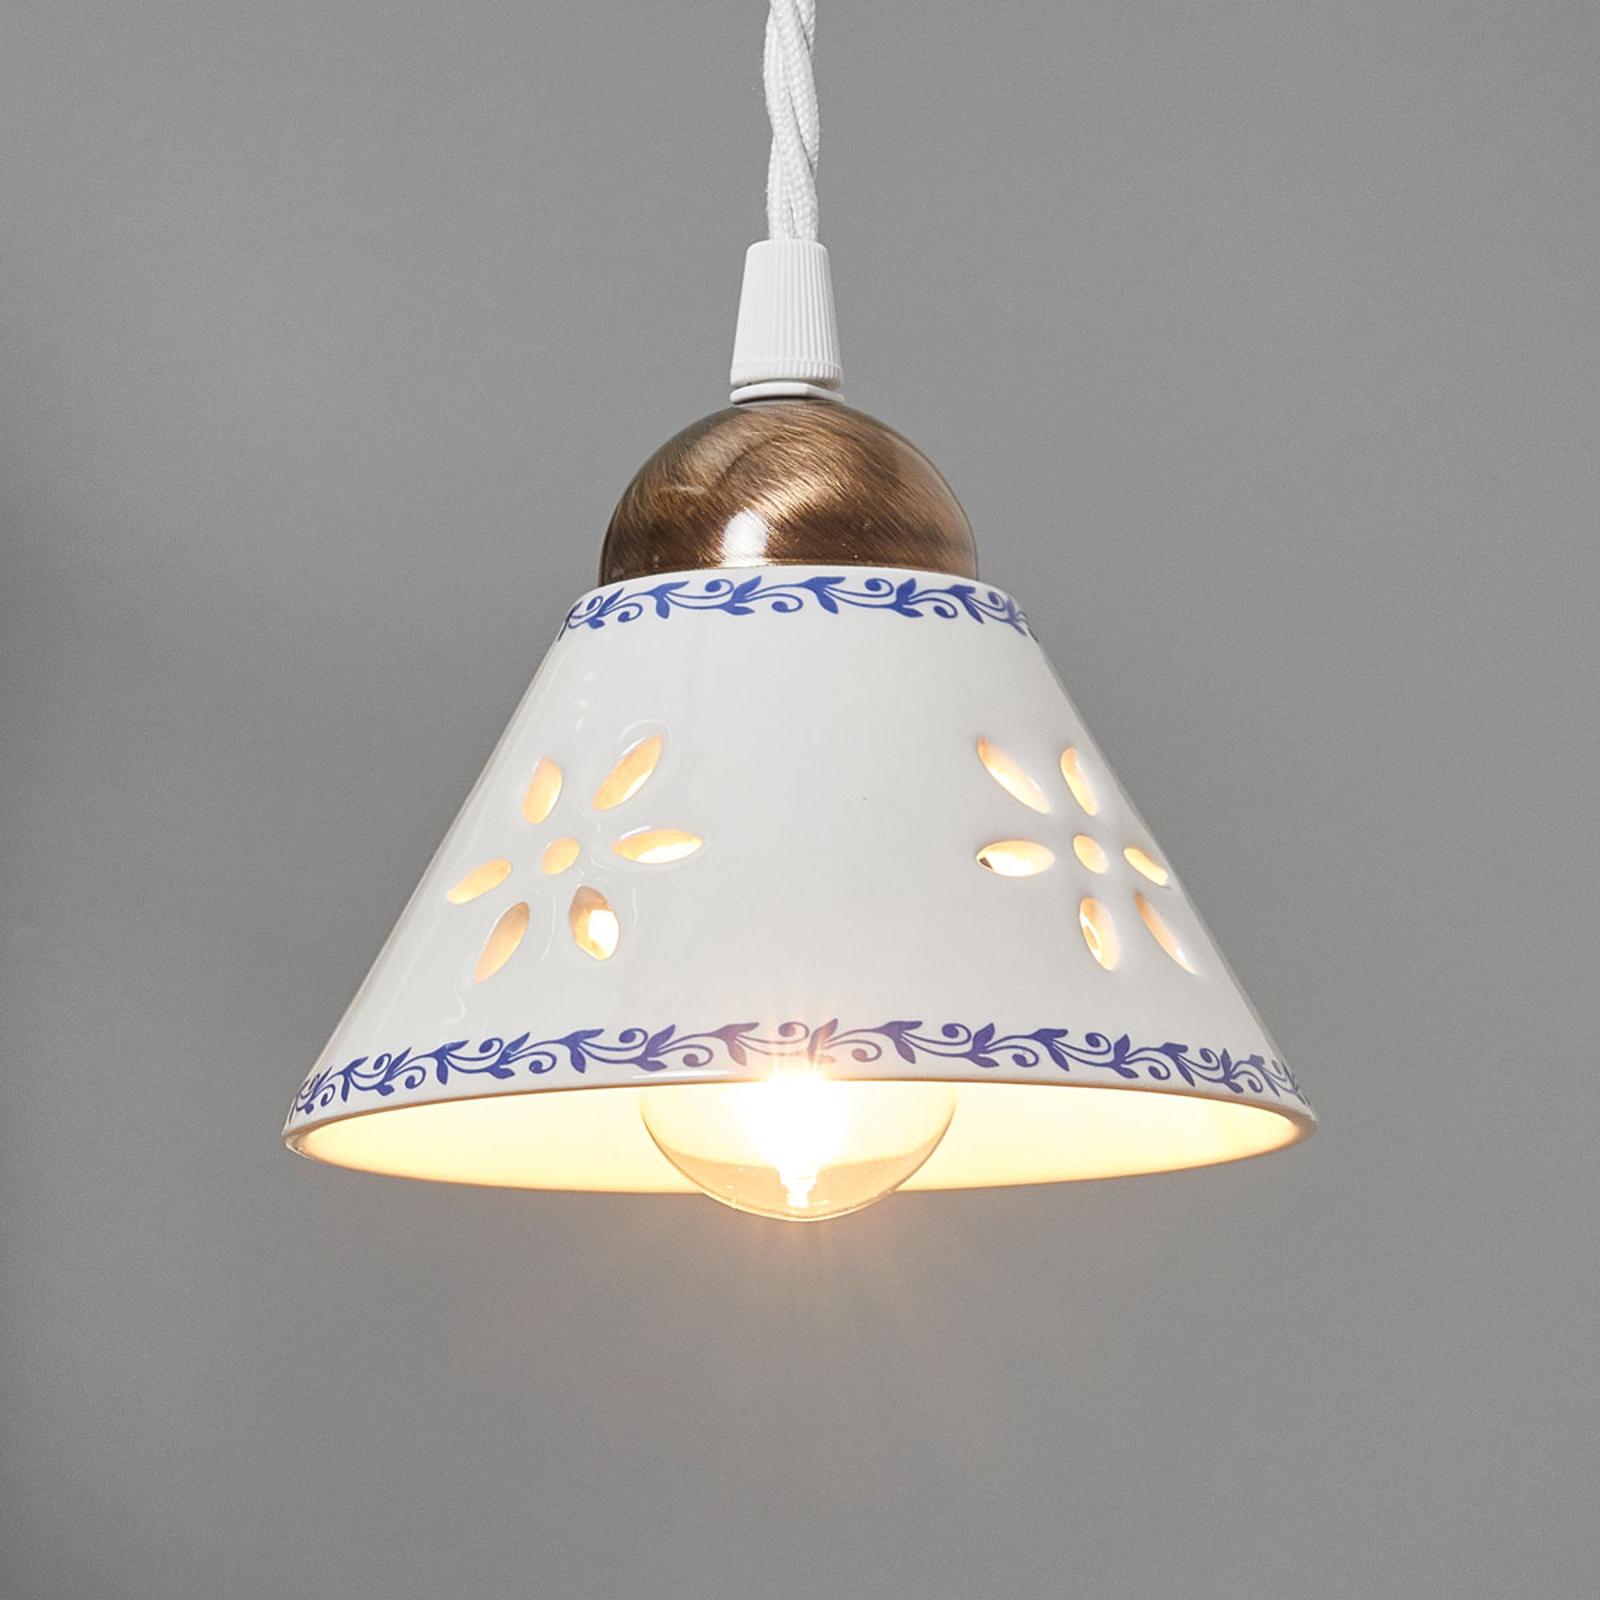 Lámpara colgante NONNA de cerámica blanca